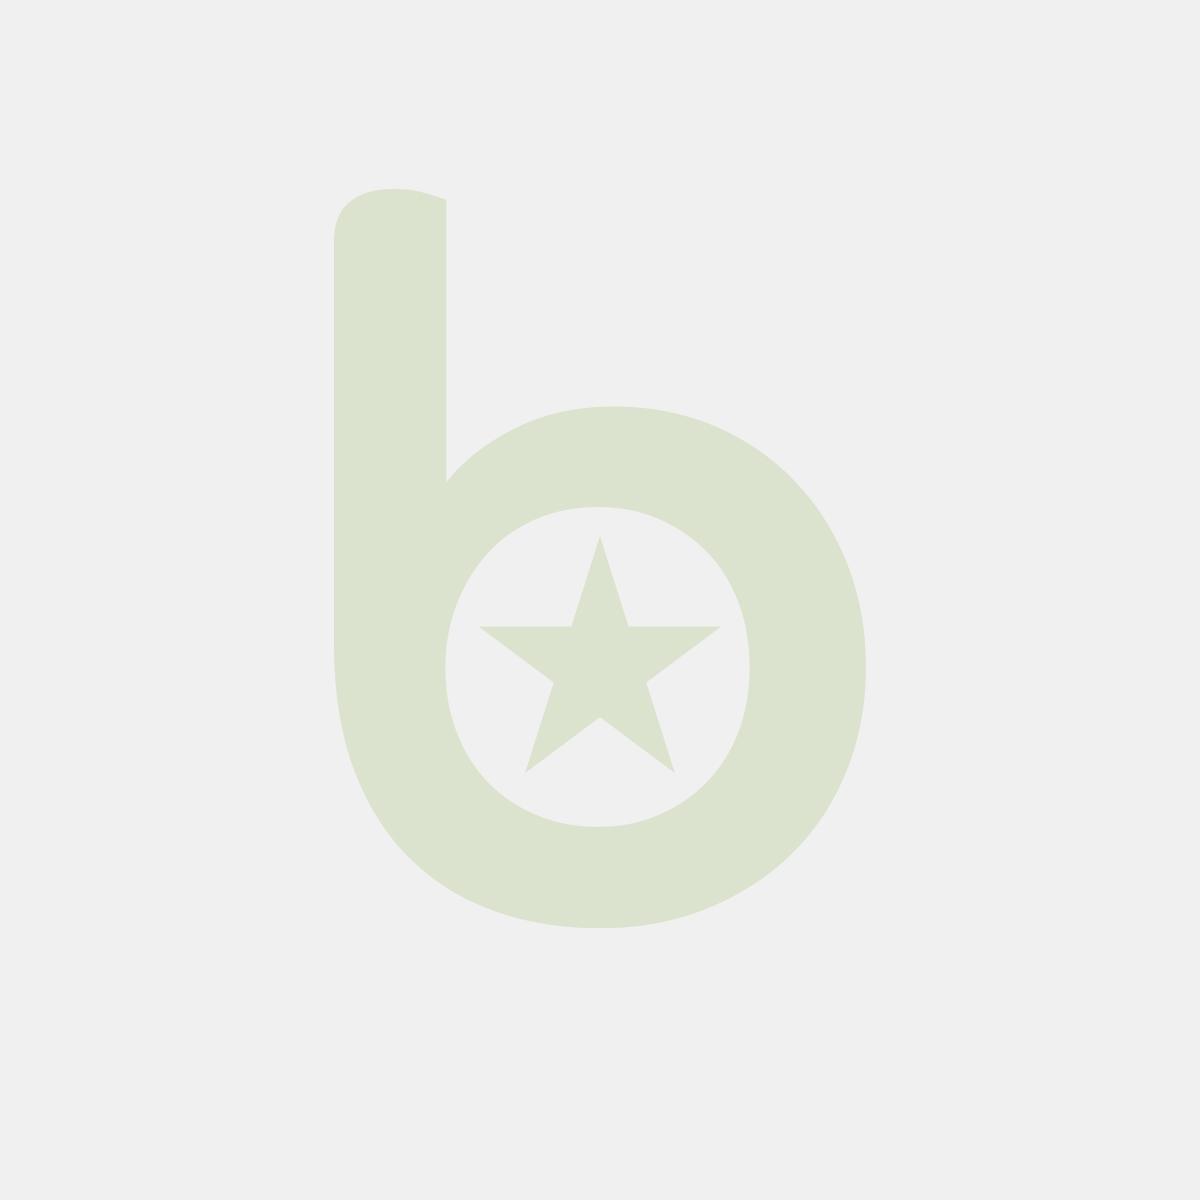 FINGERFOOD - patyczki 12 cm STAR zielone op. 100 sztuk